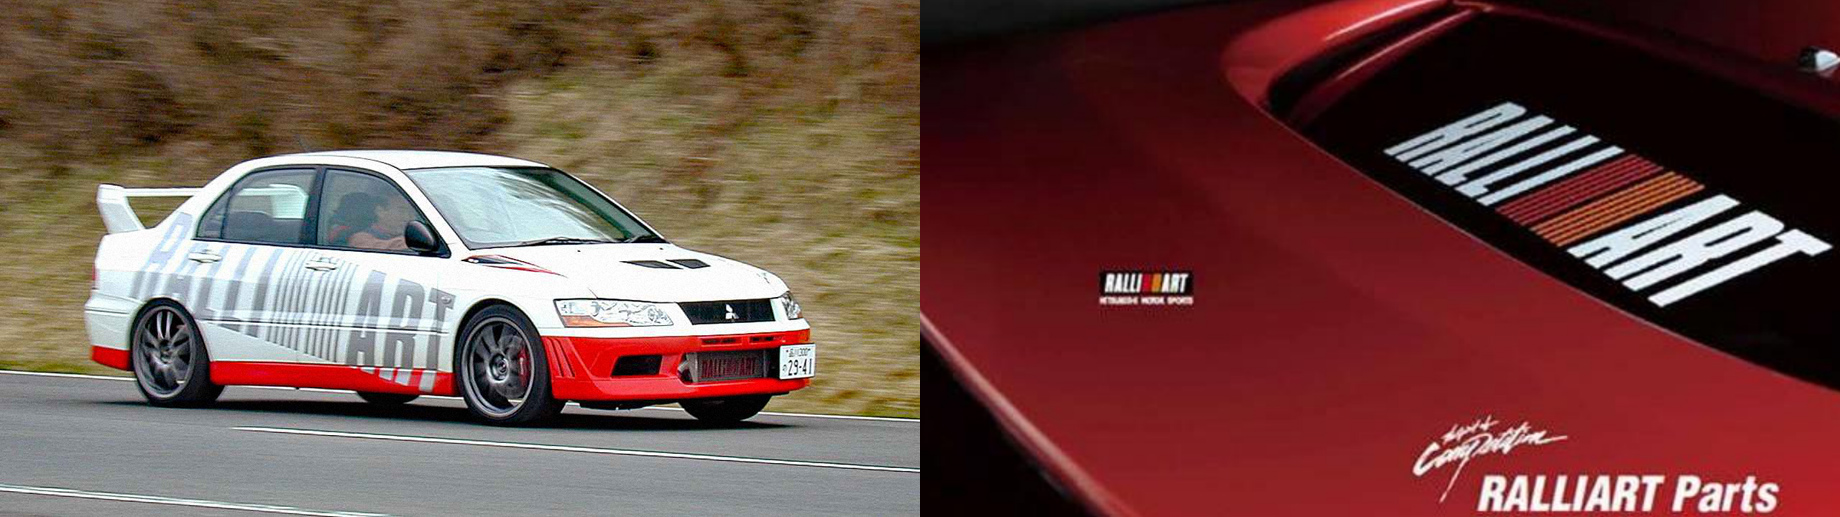 Крыло Mitsubishi Ralliart будет возрождено во всей красе